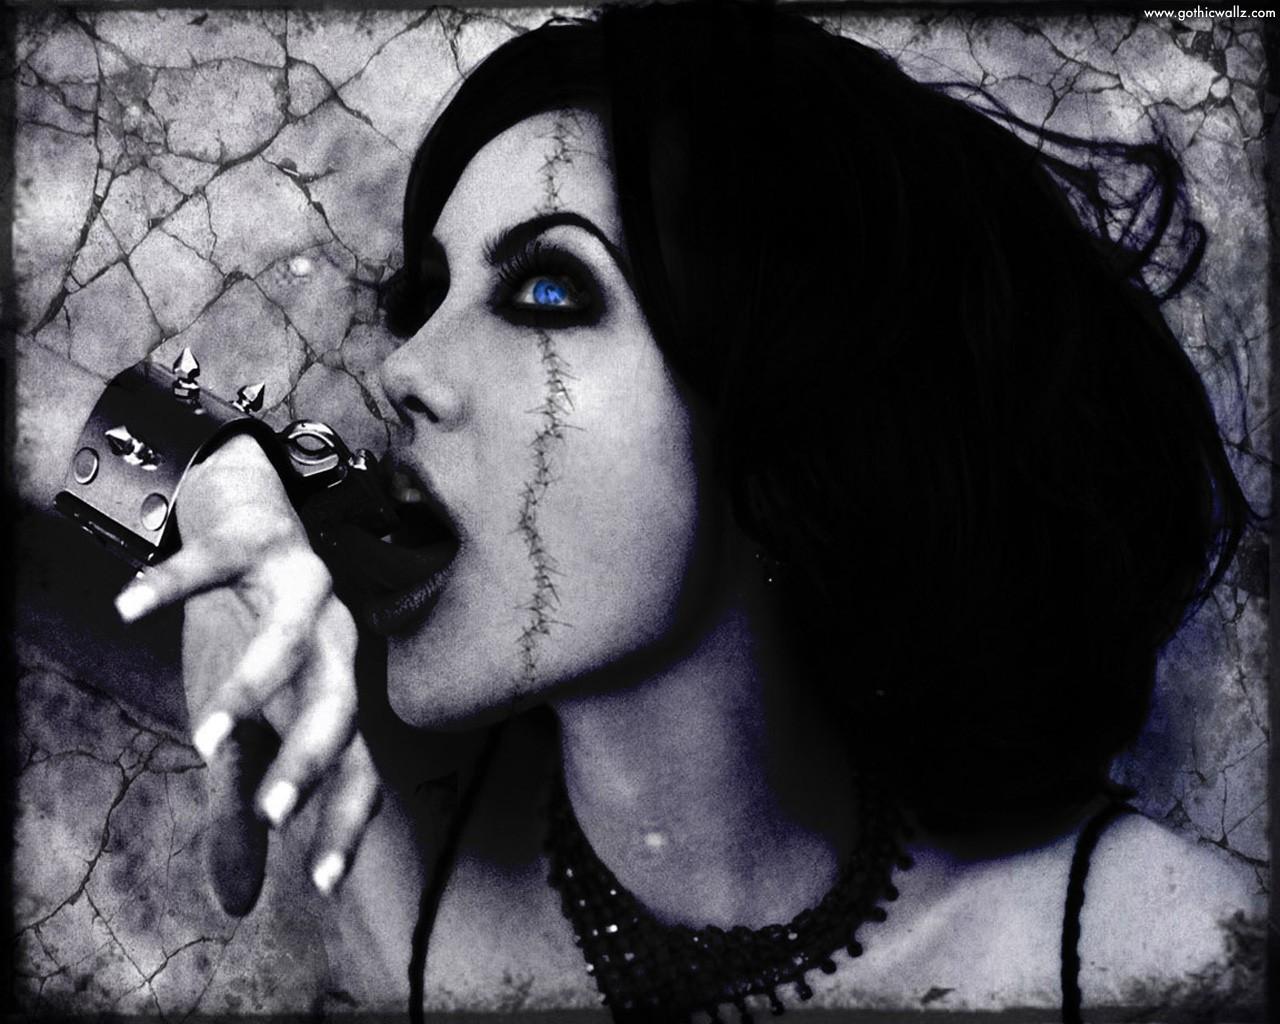 Gothic Anjelina Jolie   Dark Gothic Wallpaper Download